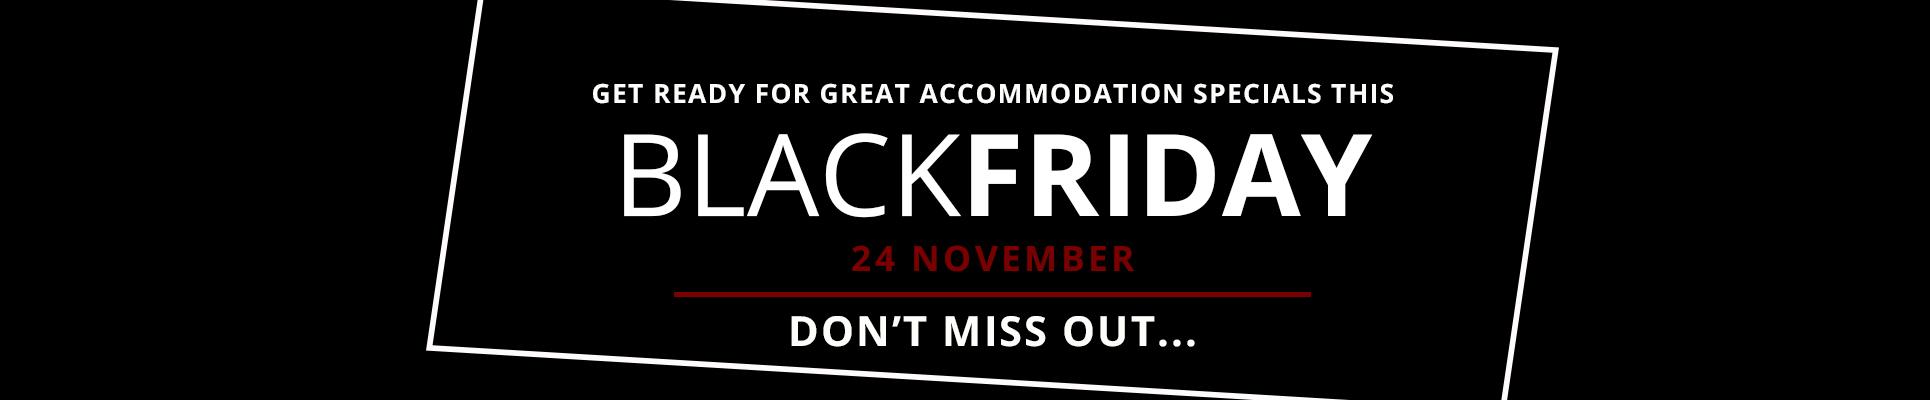 Misty Hills Country Hotel Black Friday Accommodation Specials Gauteng Muldersdrift venues